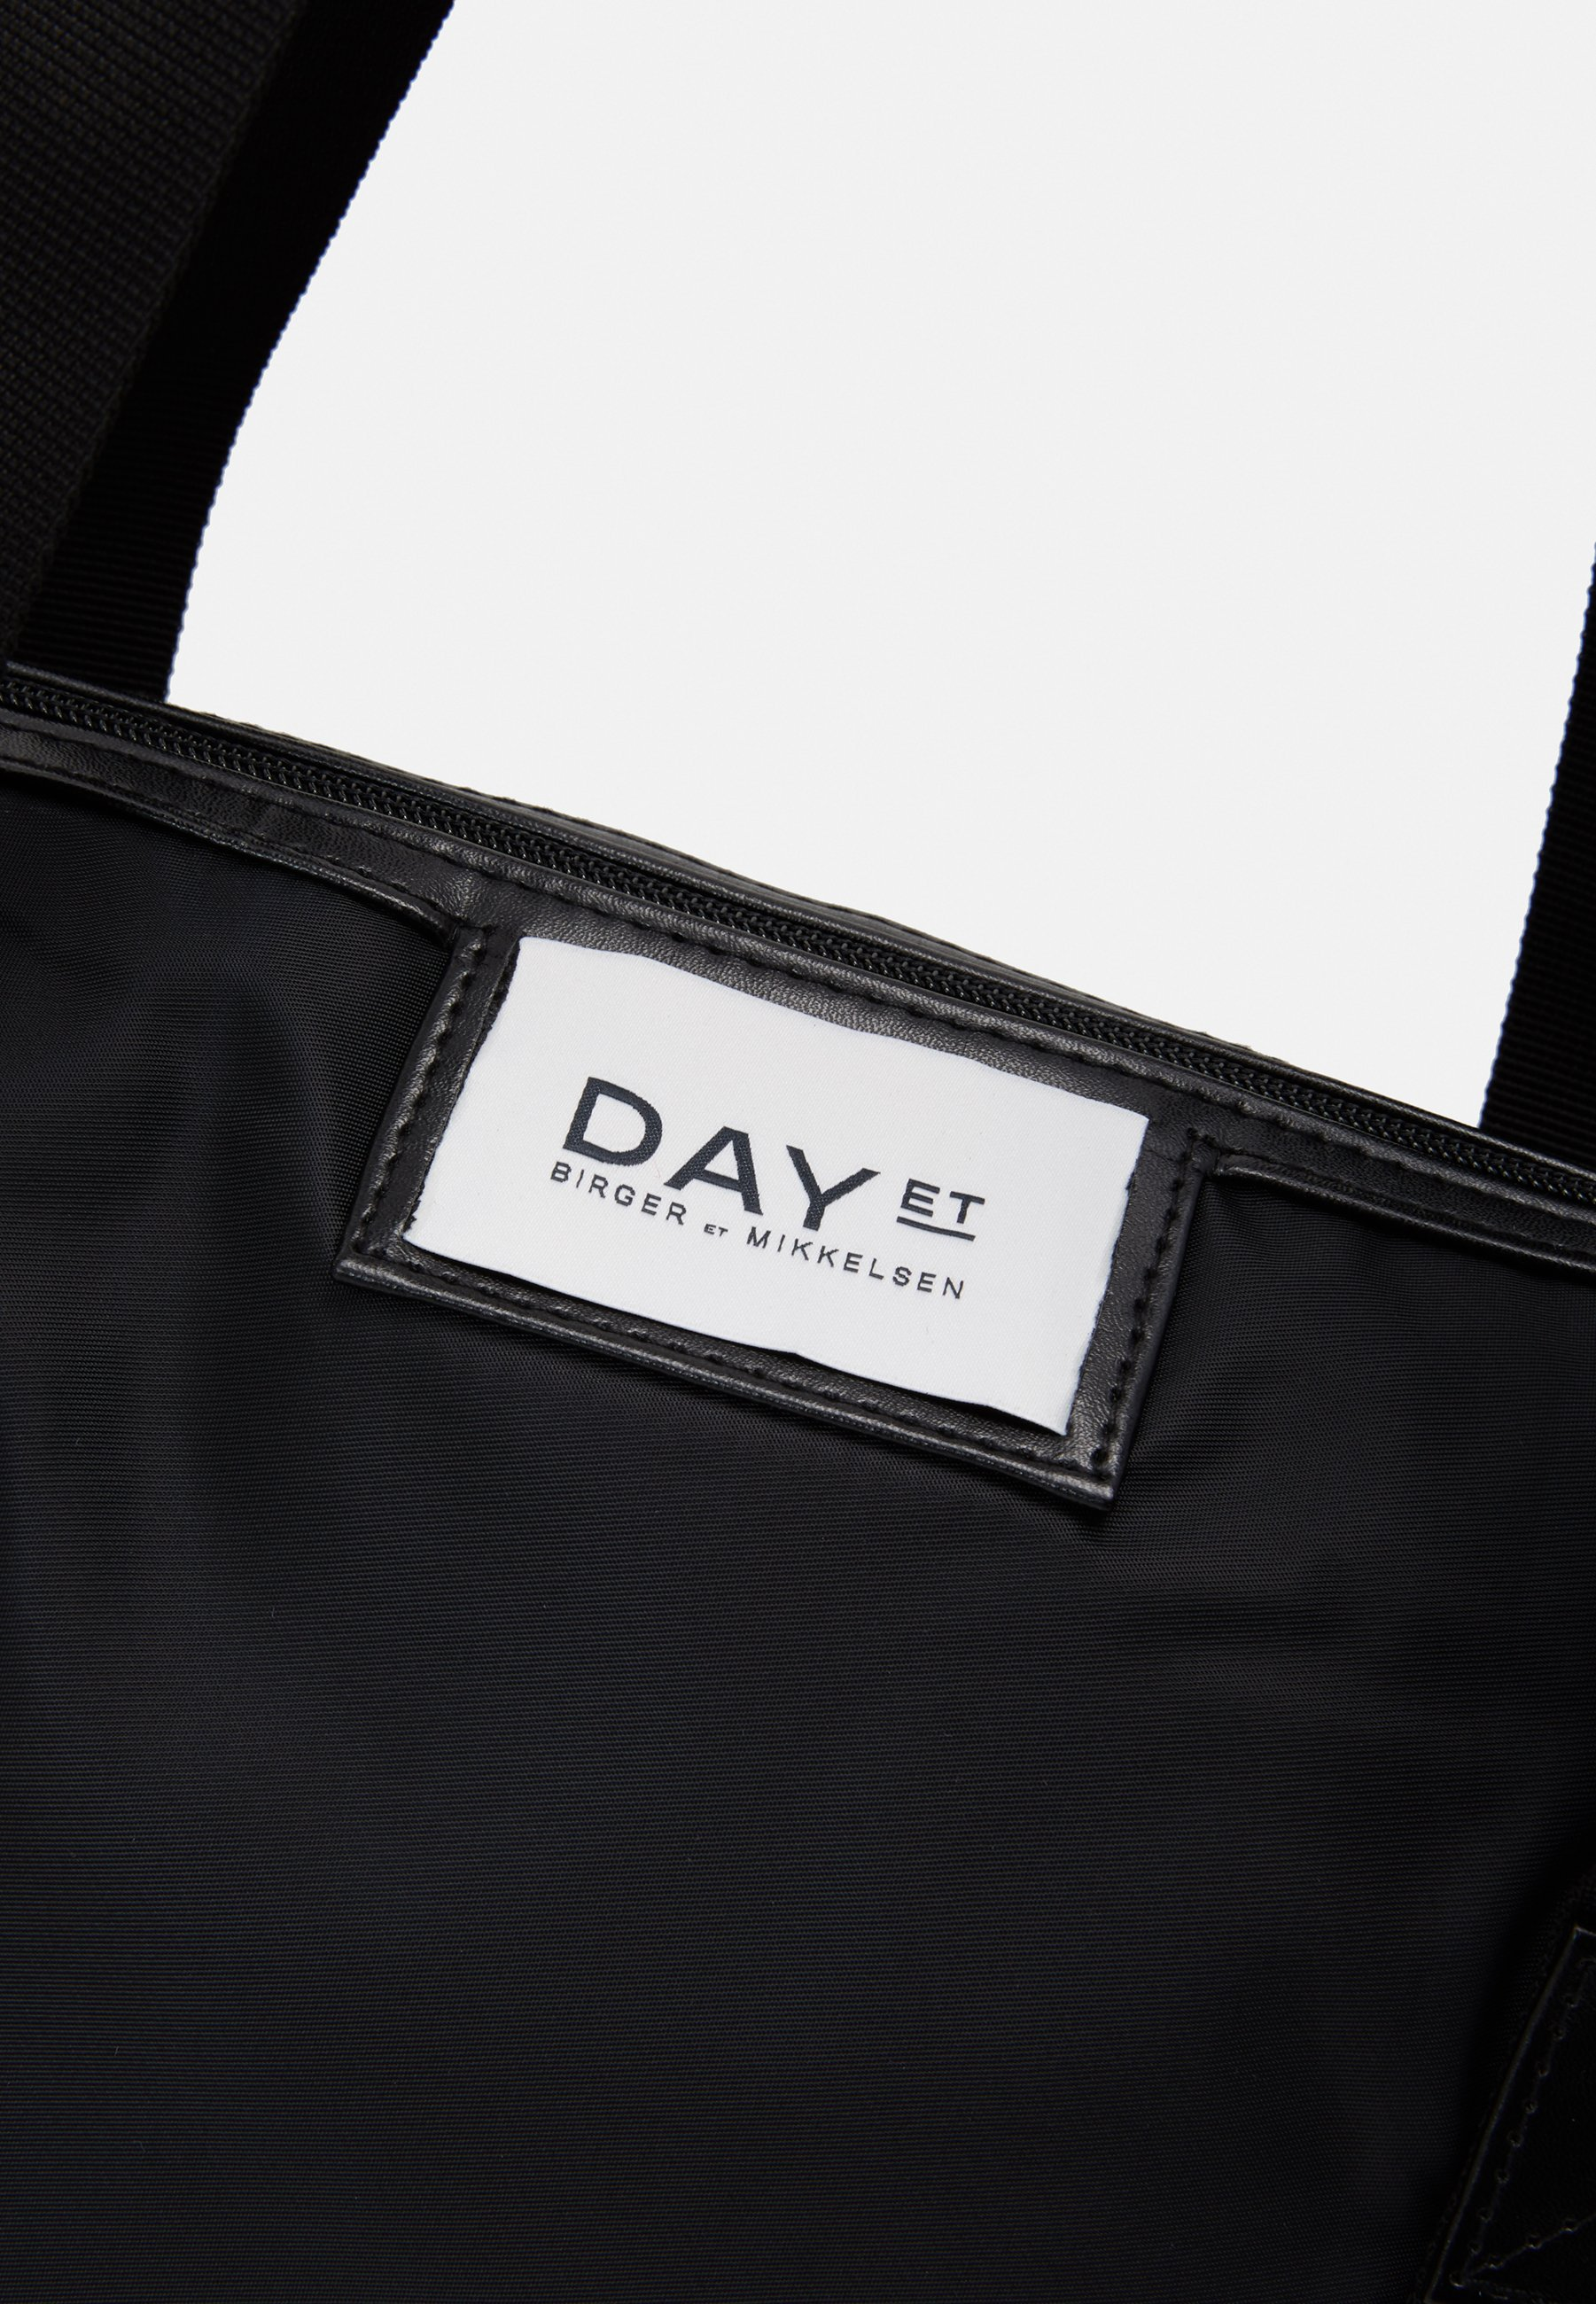 DAY ET GWENETH BAG Håndveske blacksvart Zalando.no